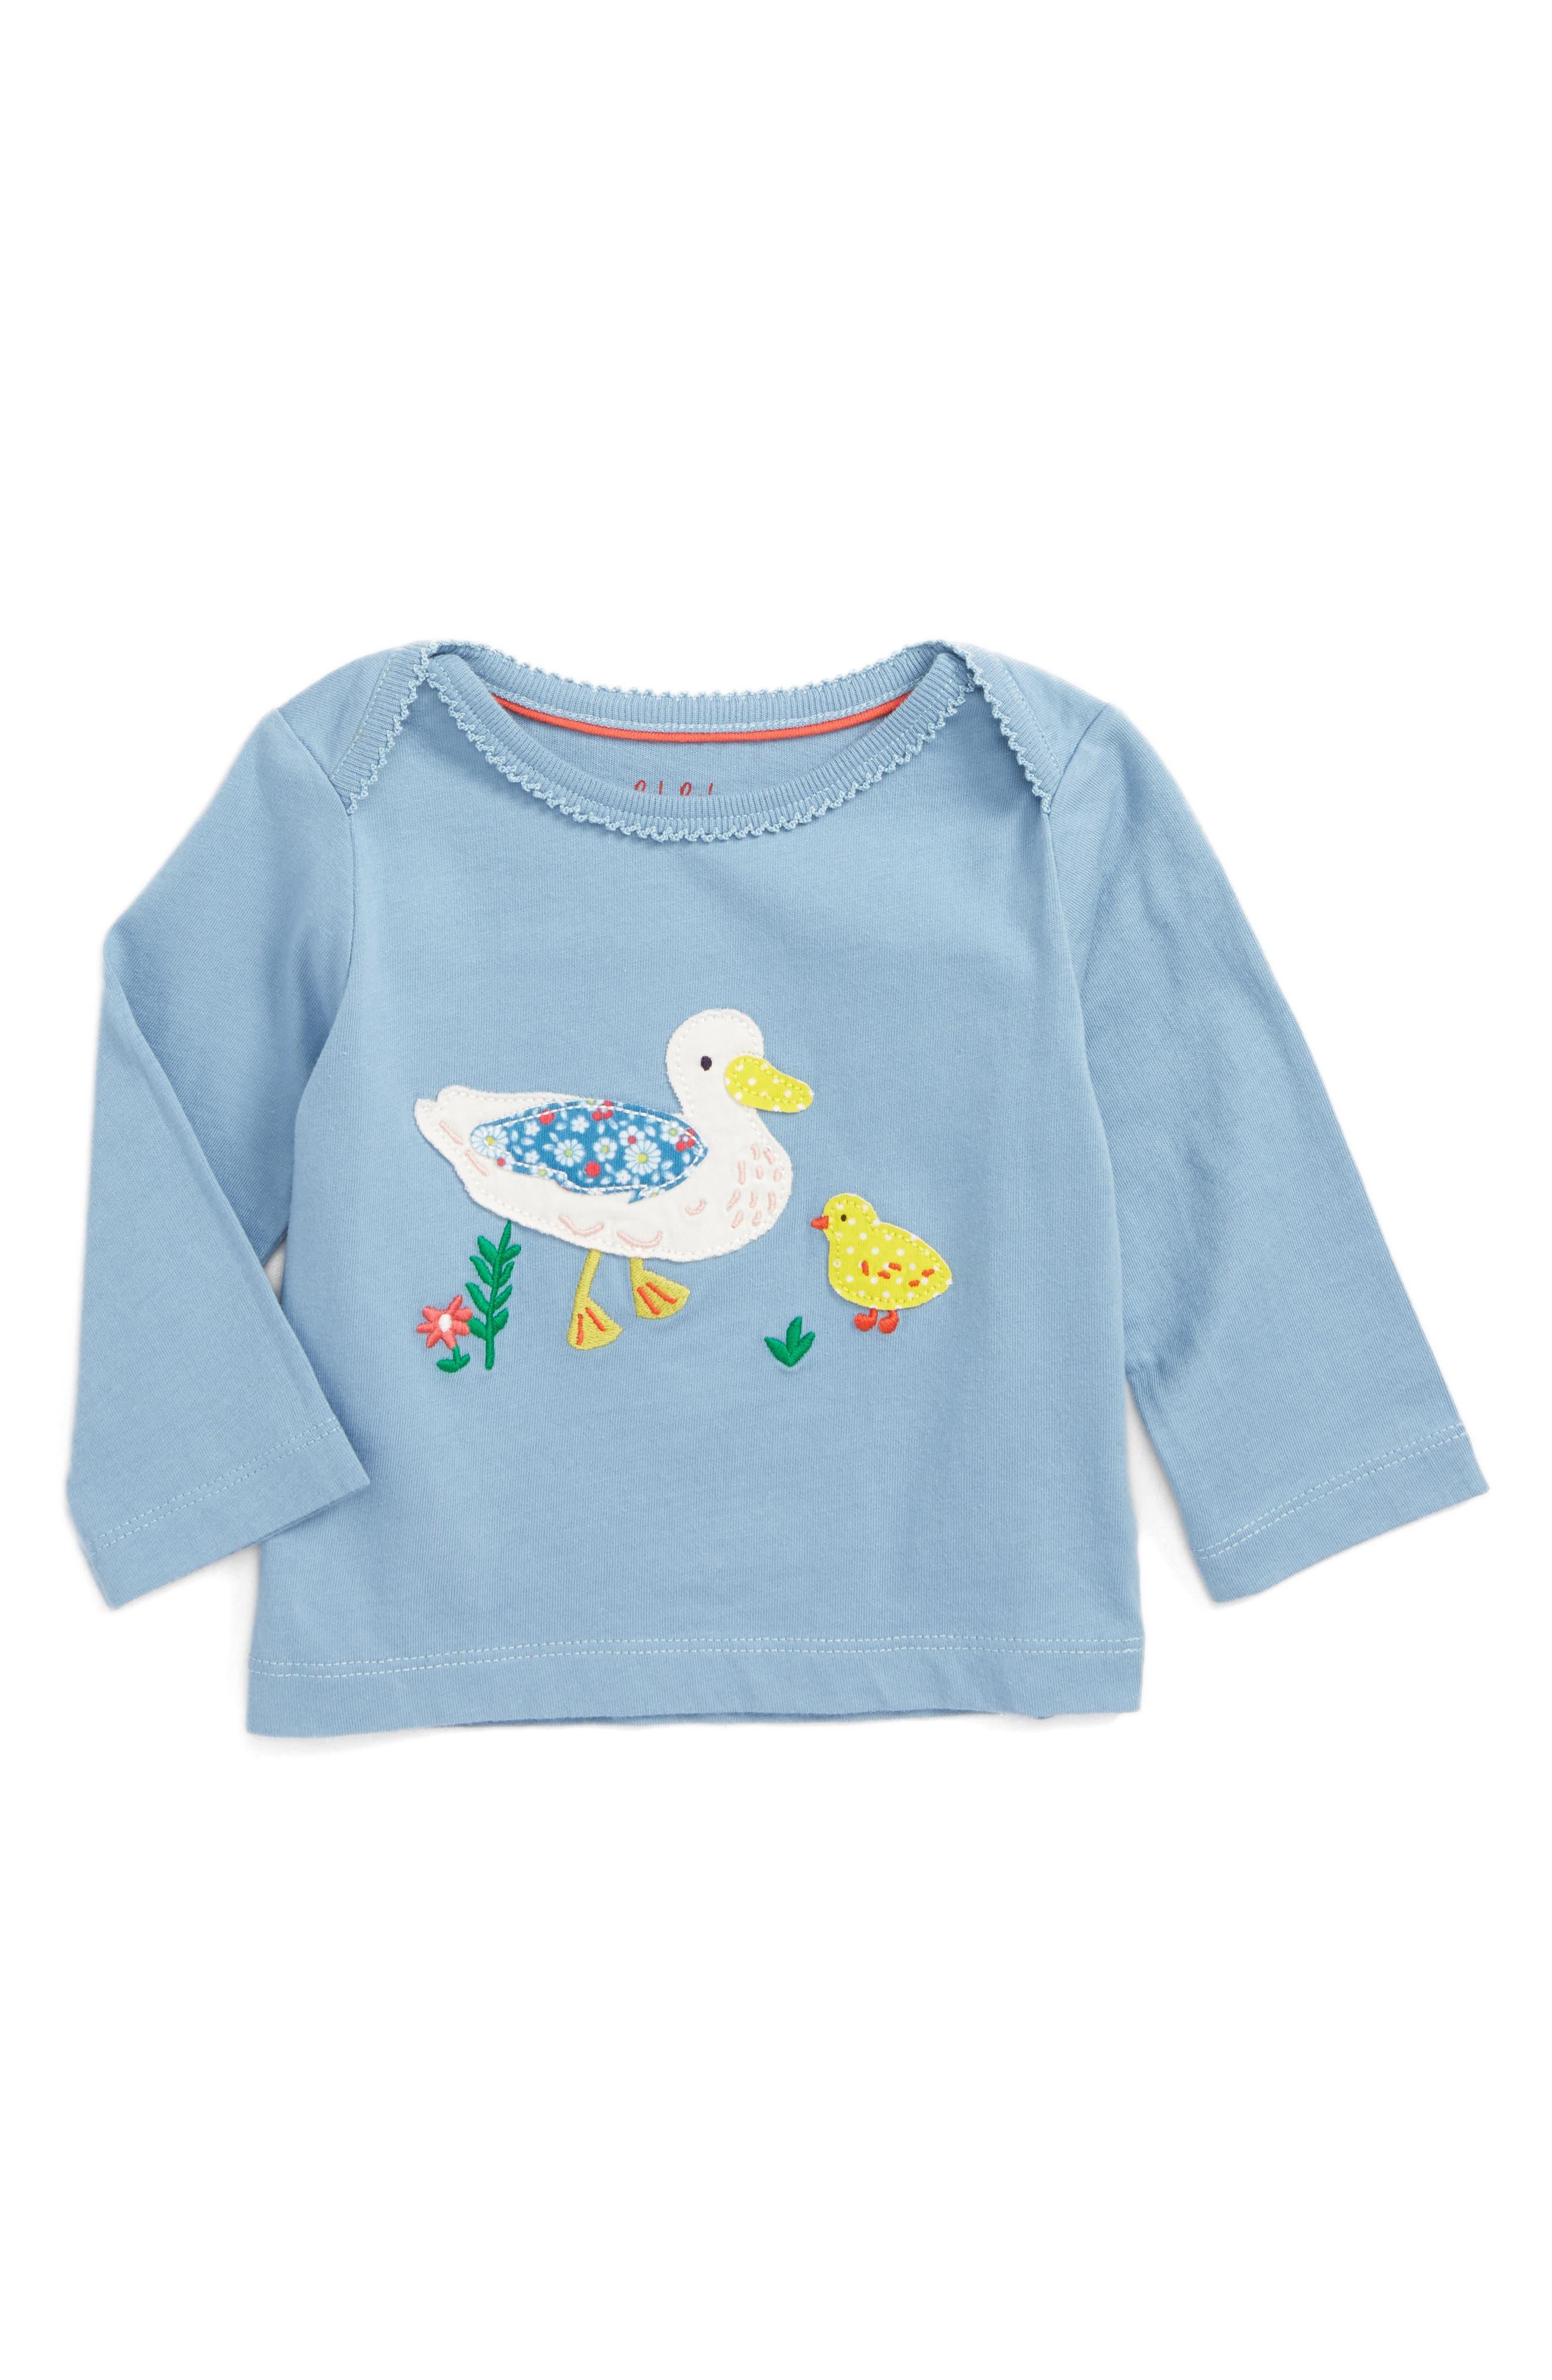 Woodland Appliqué Tee,                         Main,                         color, Wren Blue Ducks